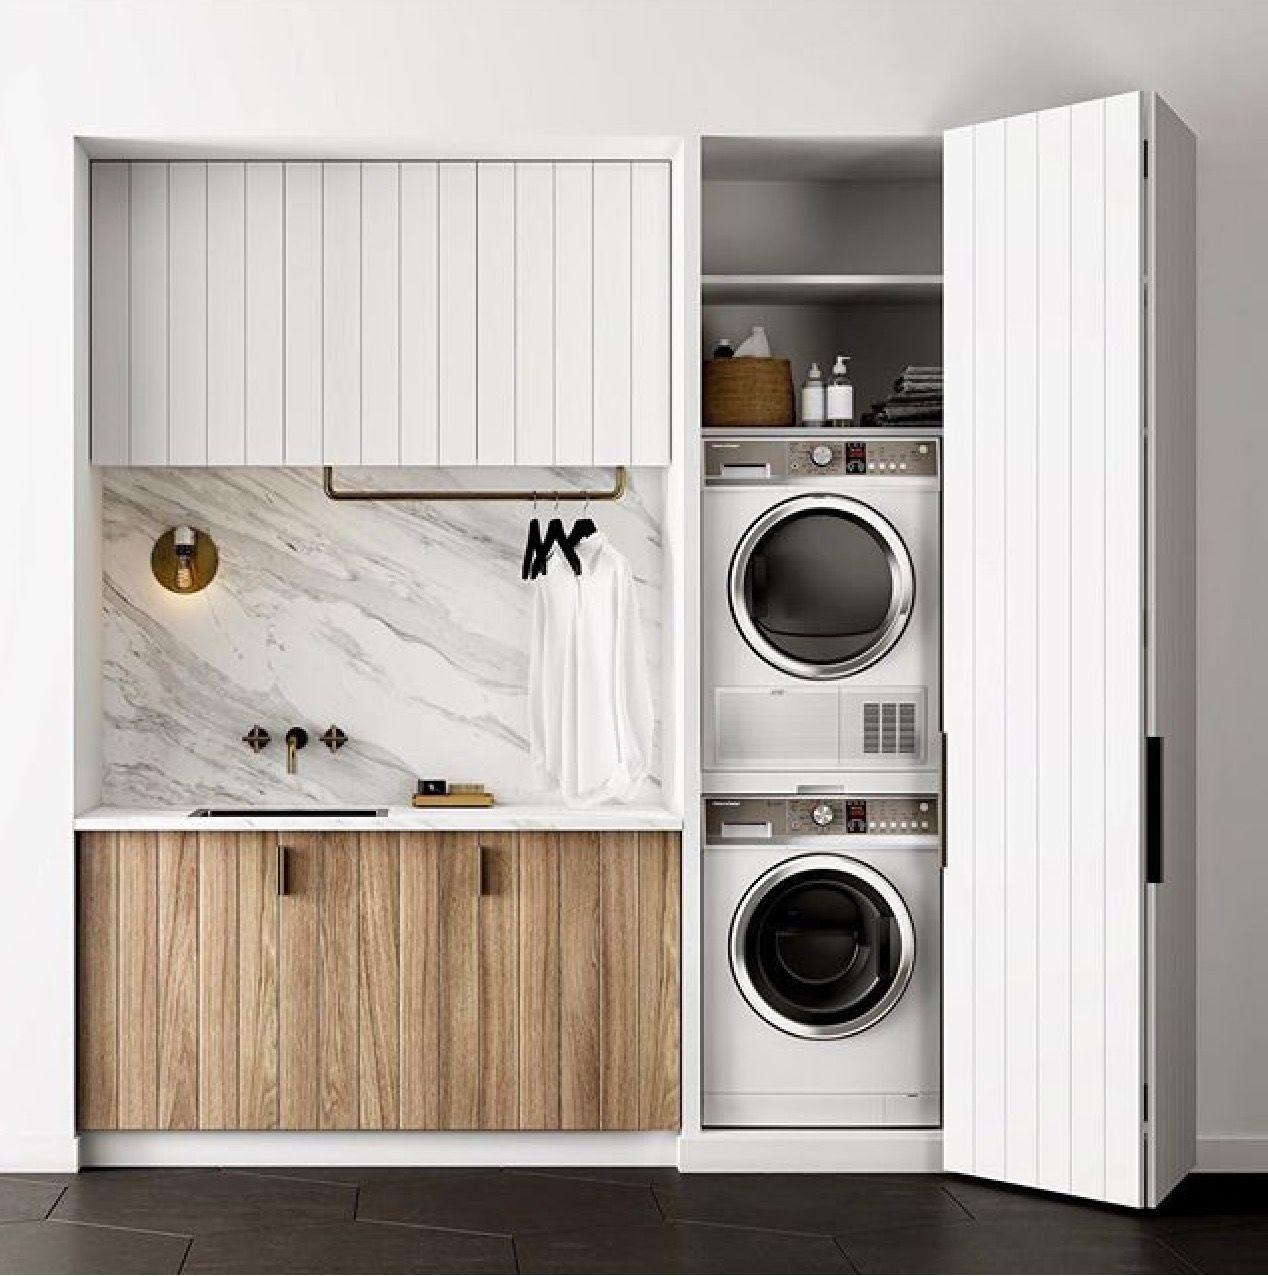 European Style Kitchen Remodeling Ideas: Euro Design Laundry. Lovin It!